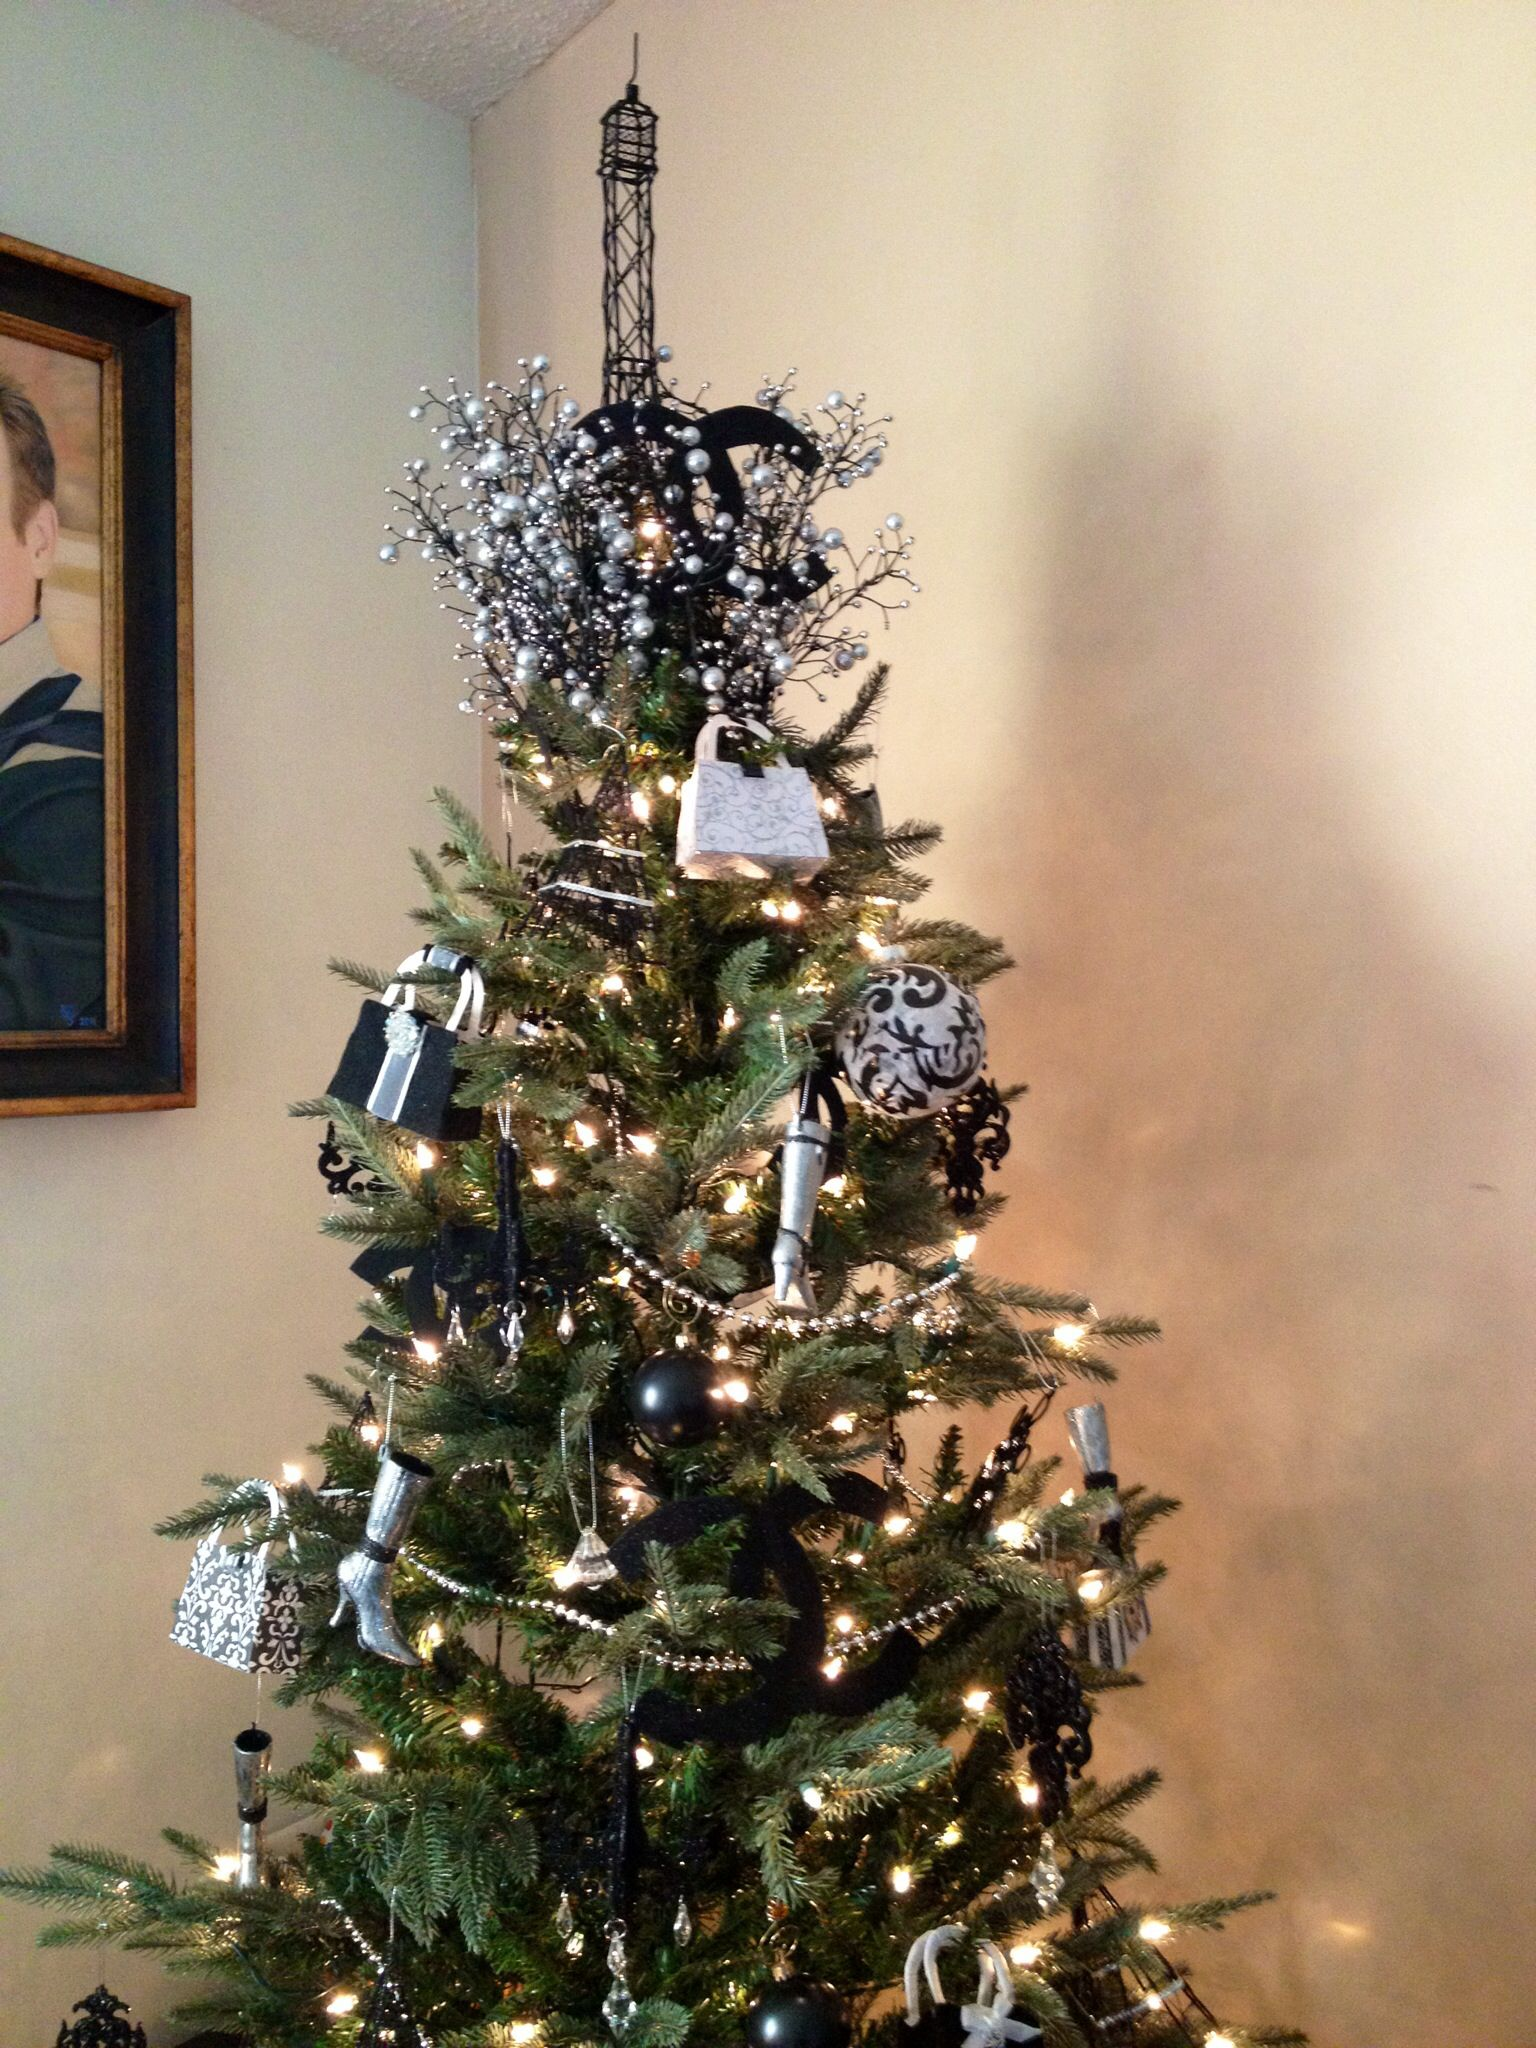 My Parisian Christmas tree | Fa la la winter decor | Pinterest ...